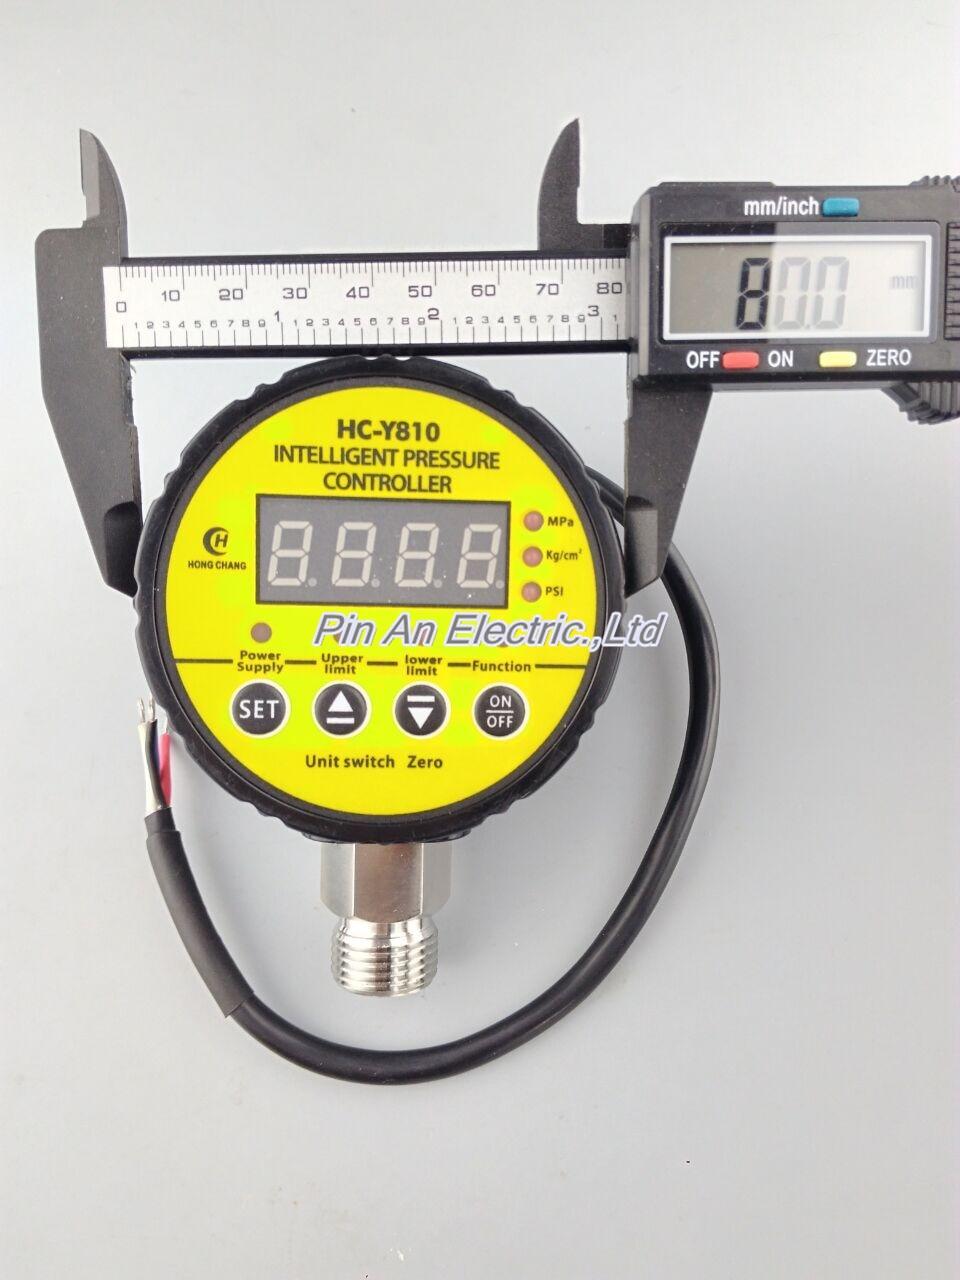 24V DC Hydraulic Air Compressor Digital Pressure Switch 0-10Mpa M20 x 1.5 13mm male thread pressure relief valve for air compressor